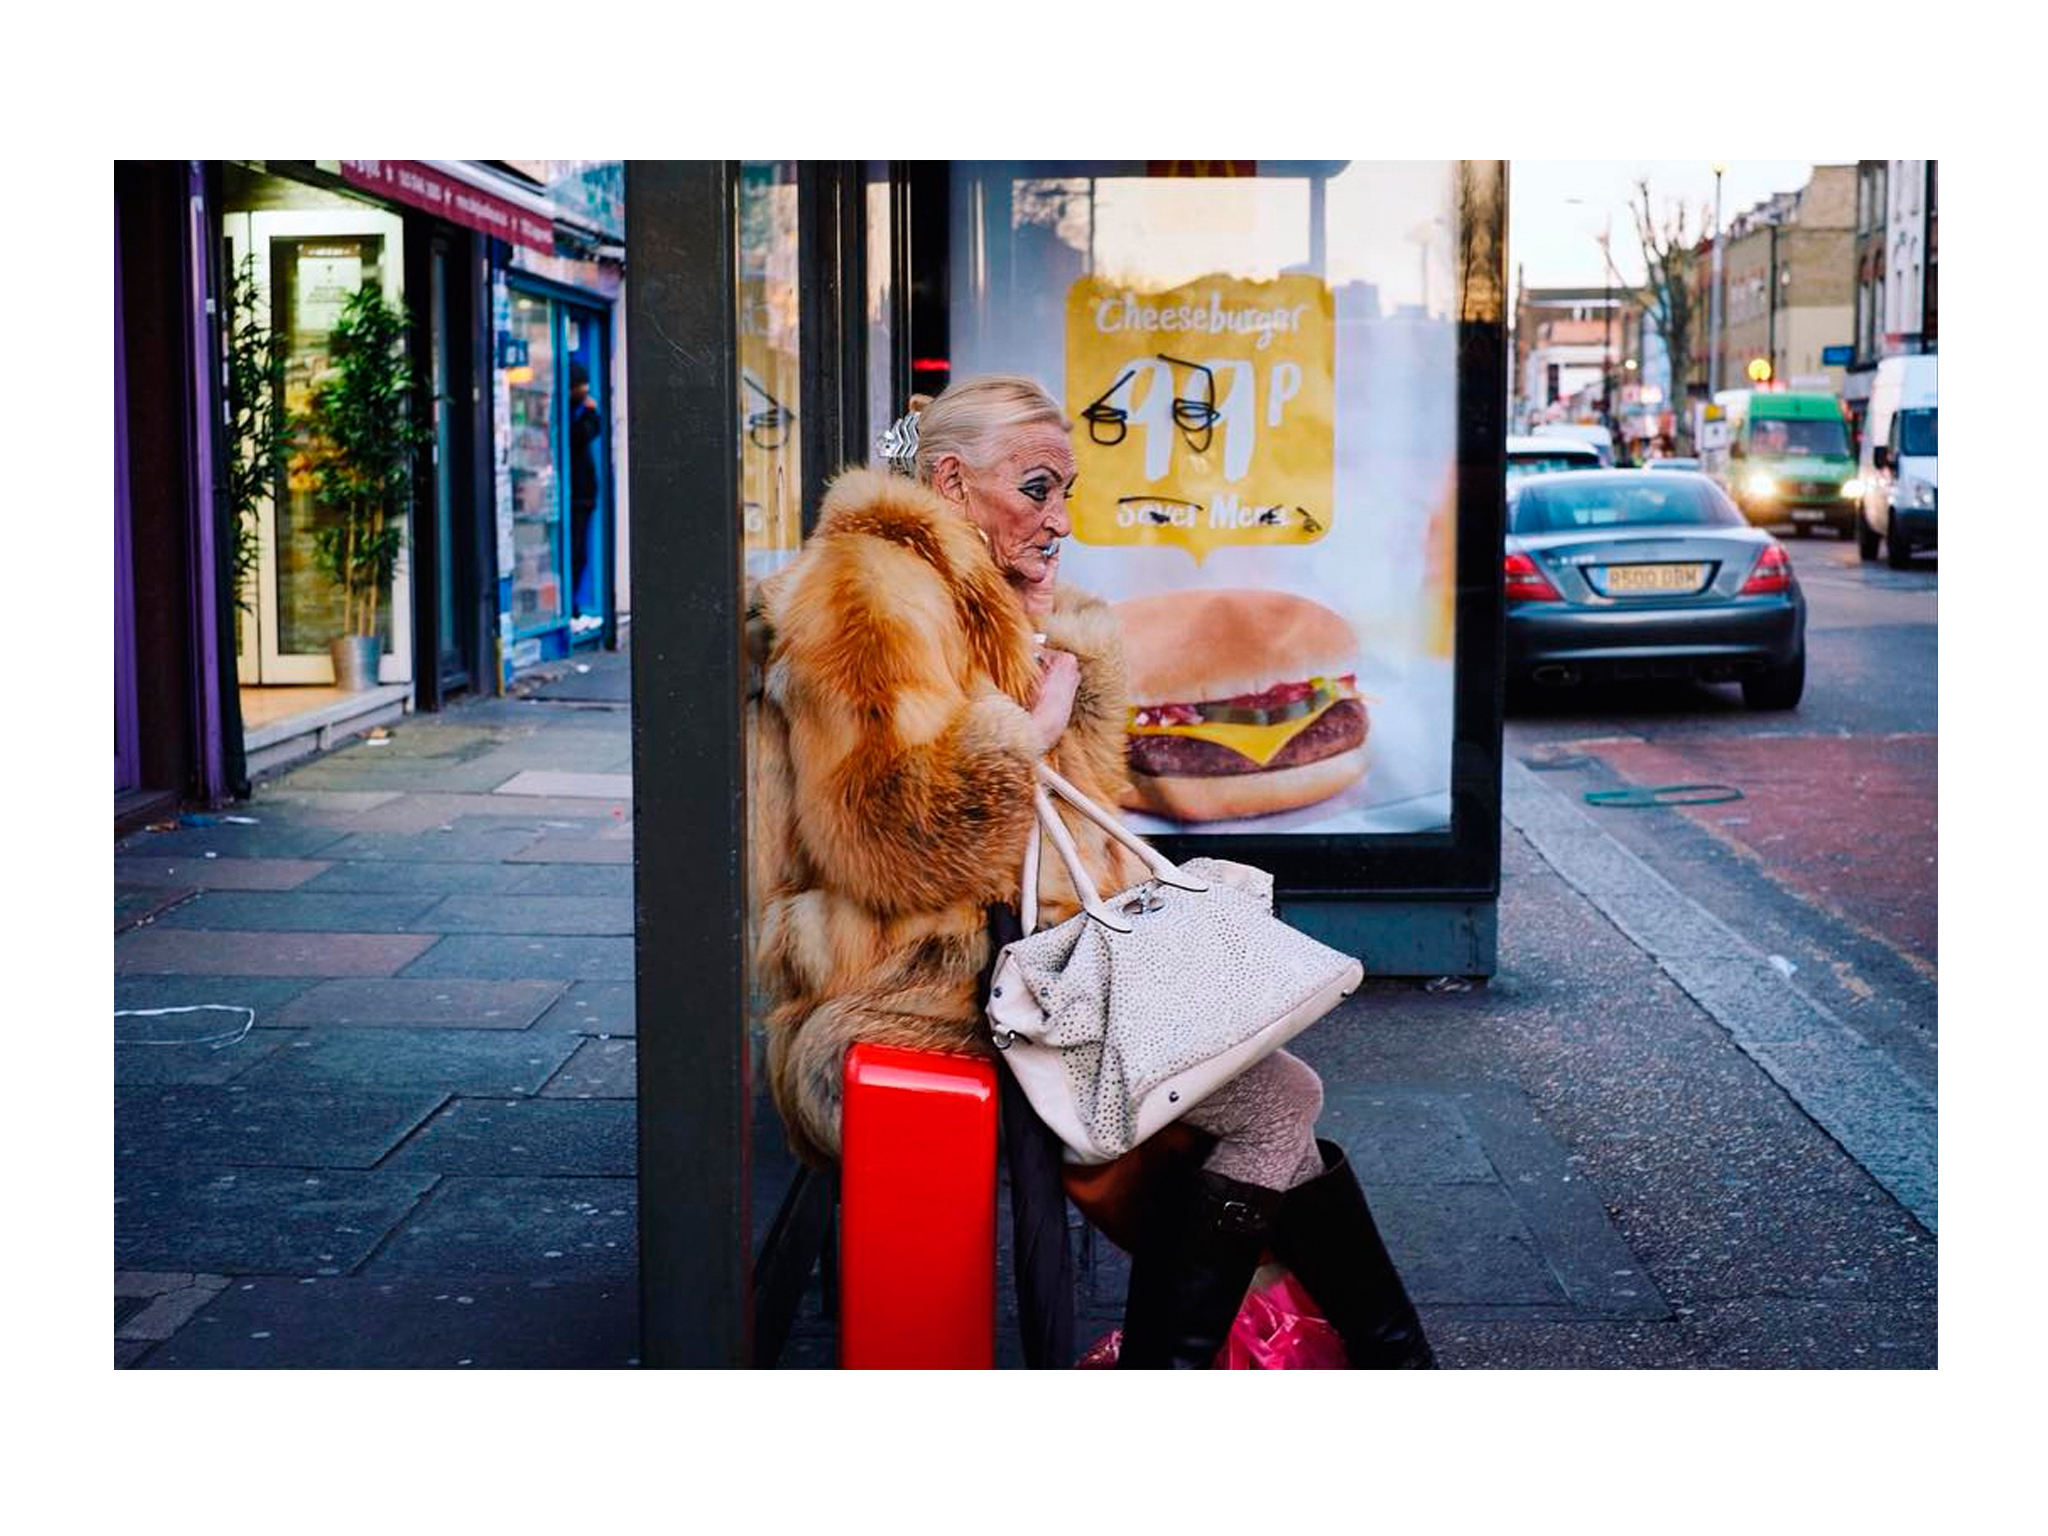 Londoner's London photos winner: Real Londoners